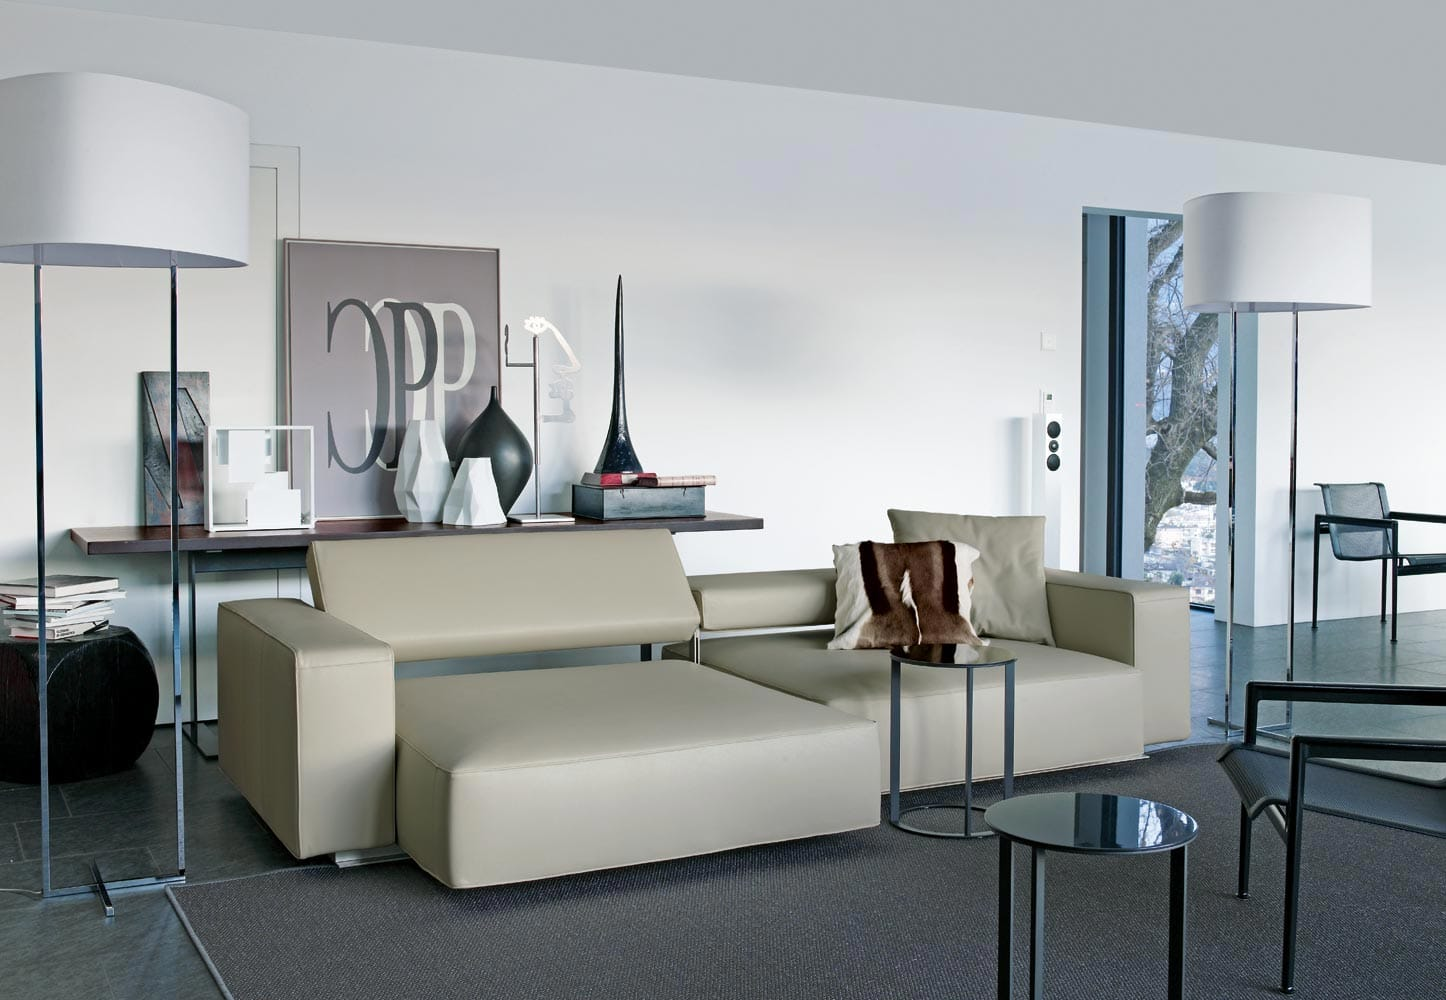 sofaprogramm andy von b b italia. Black Bedroom Furniture Sets. Home Design Ideas